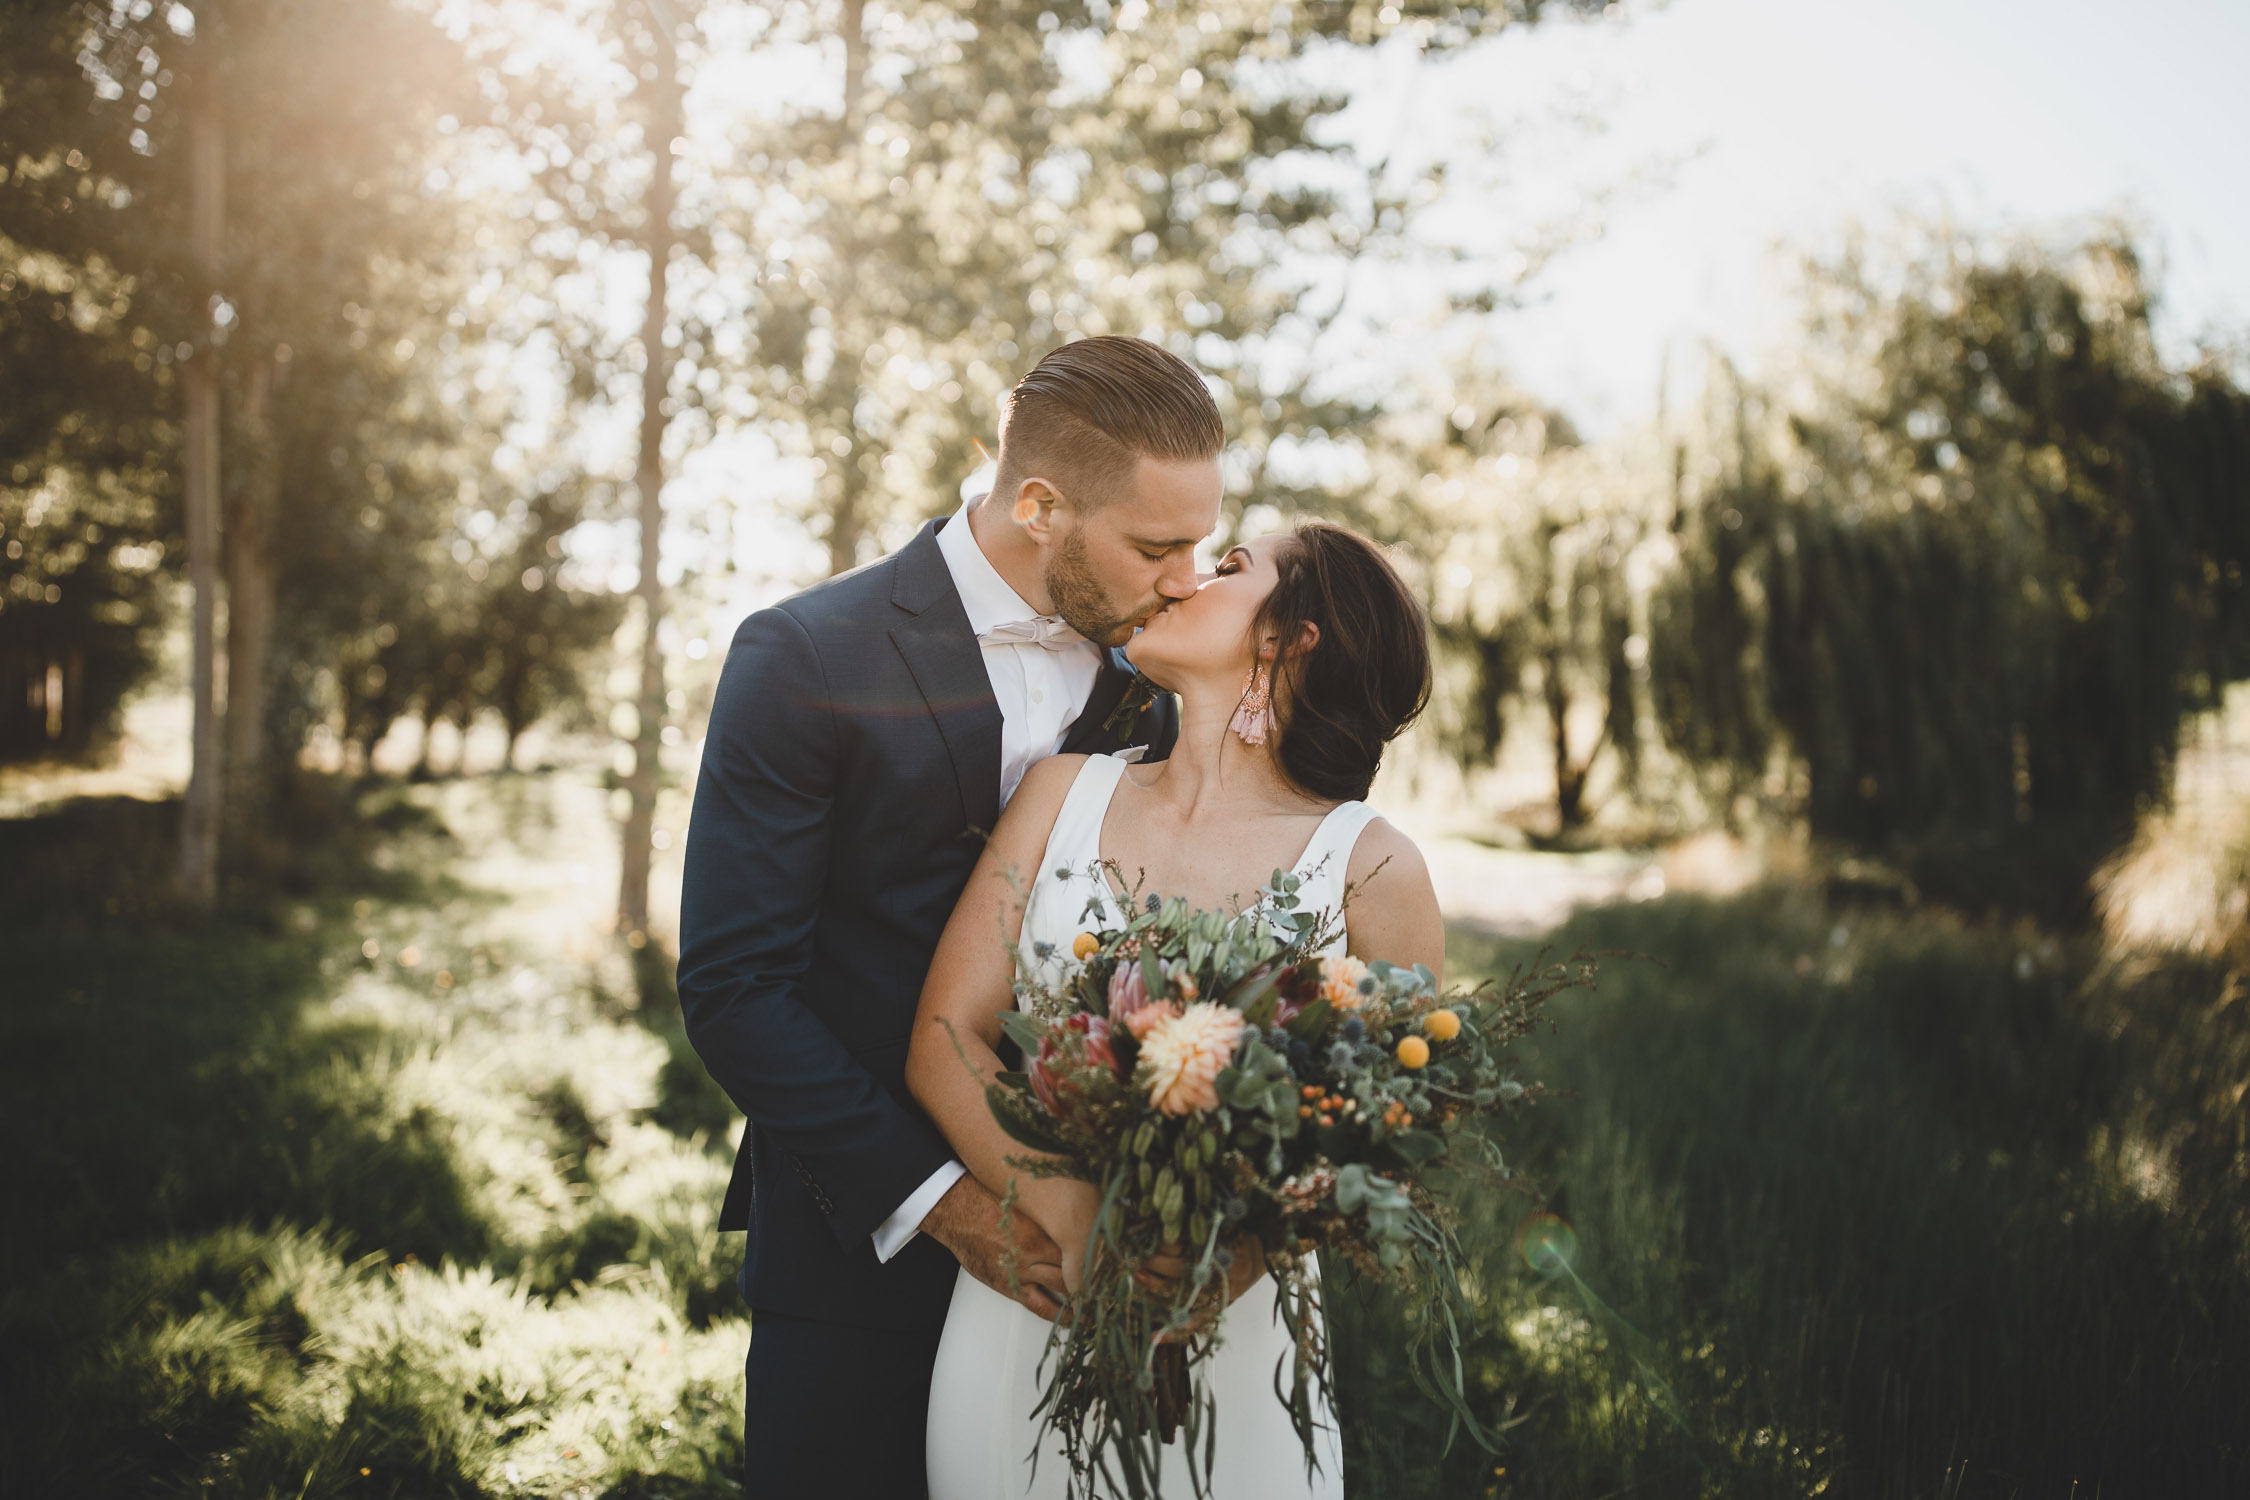 Queenstown Wedding Photographer Williams Photography